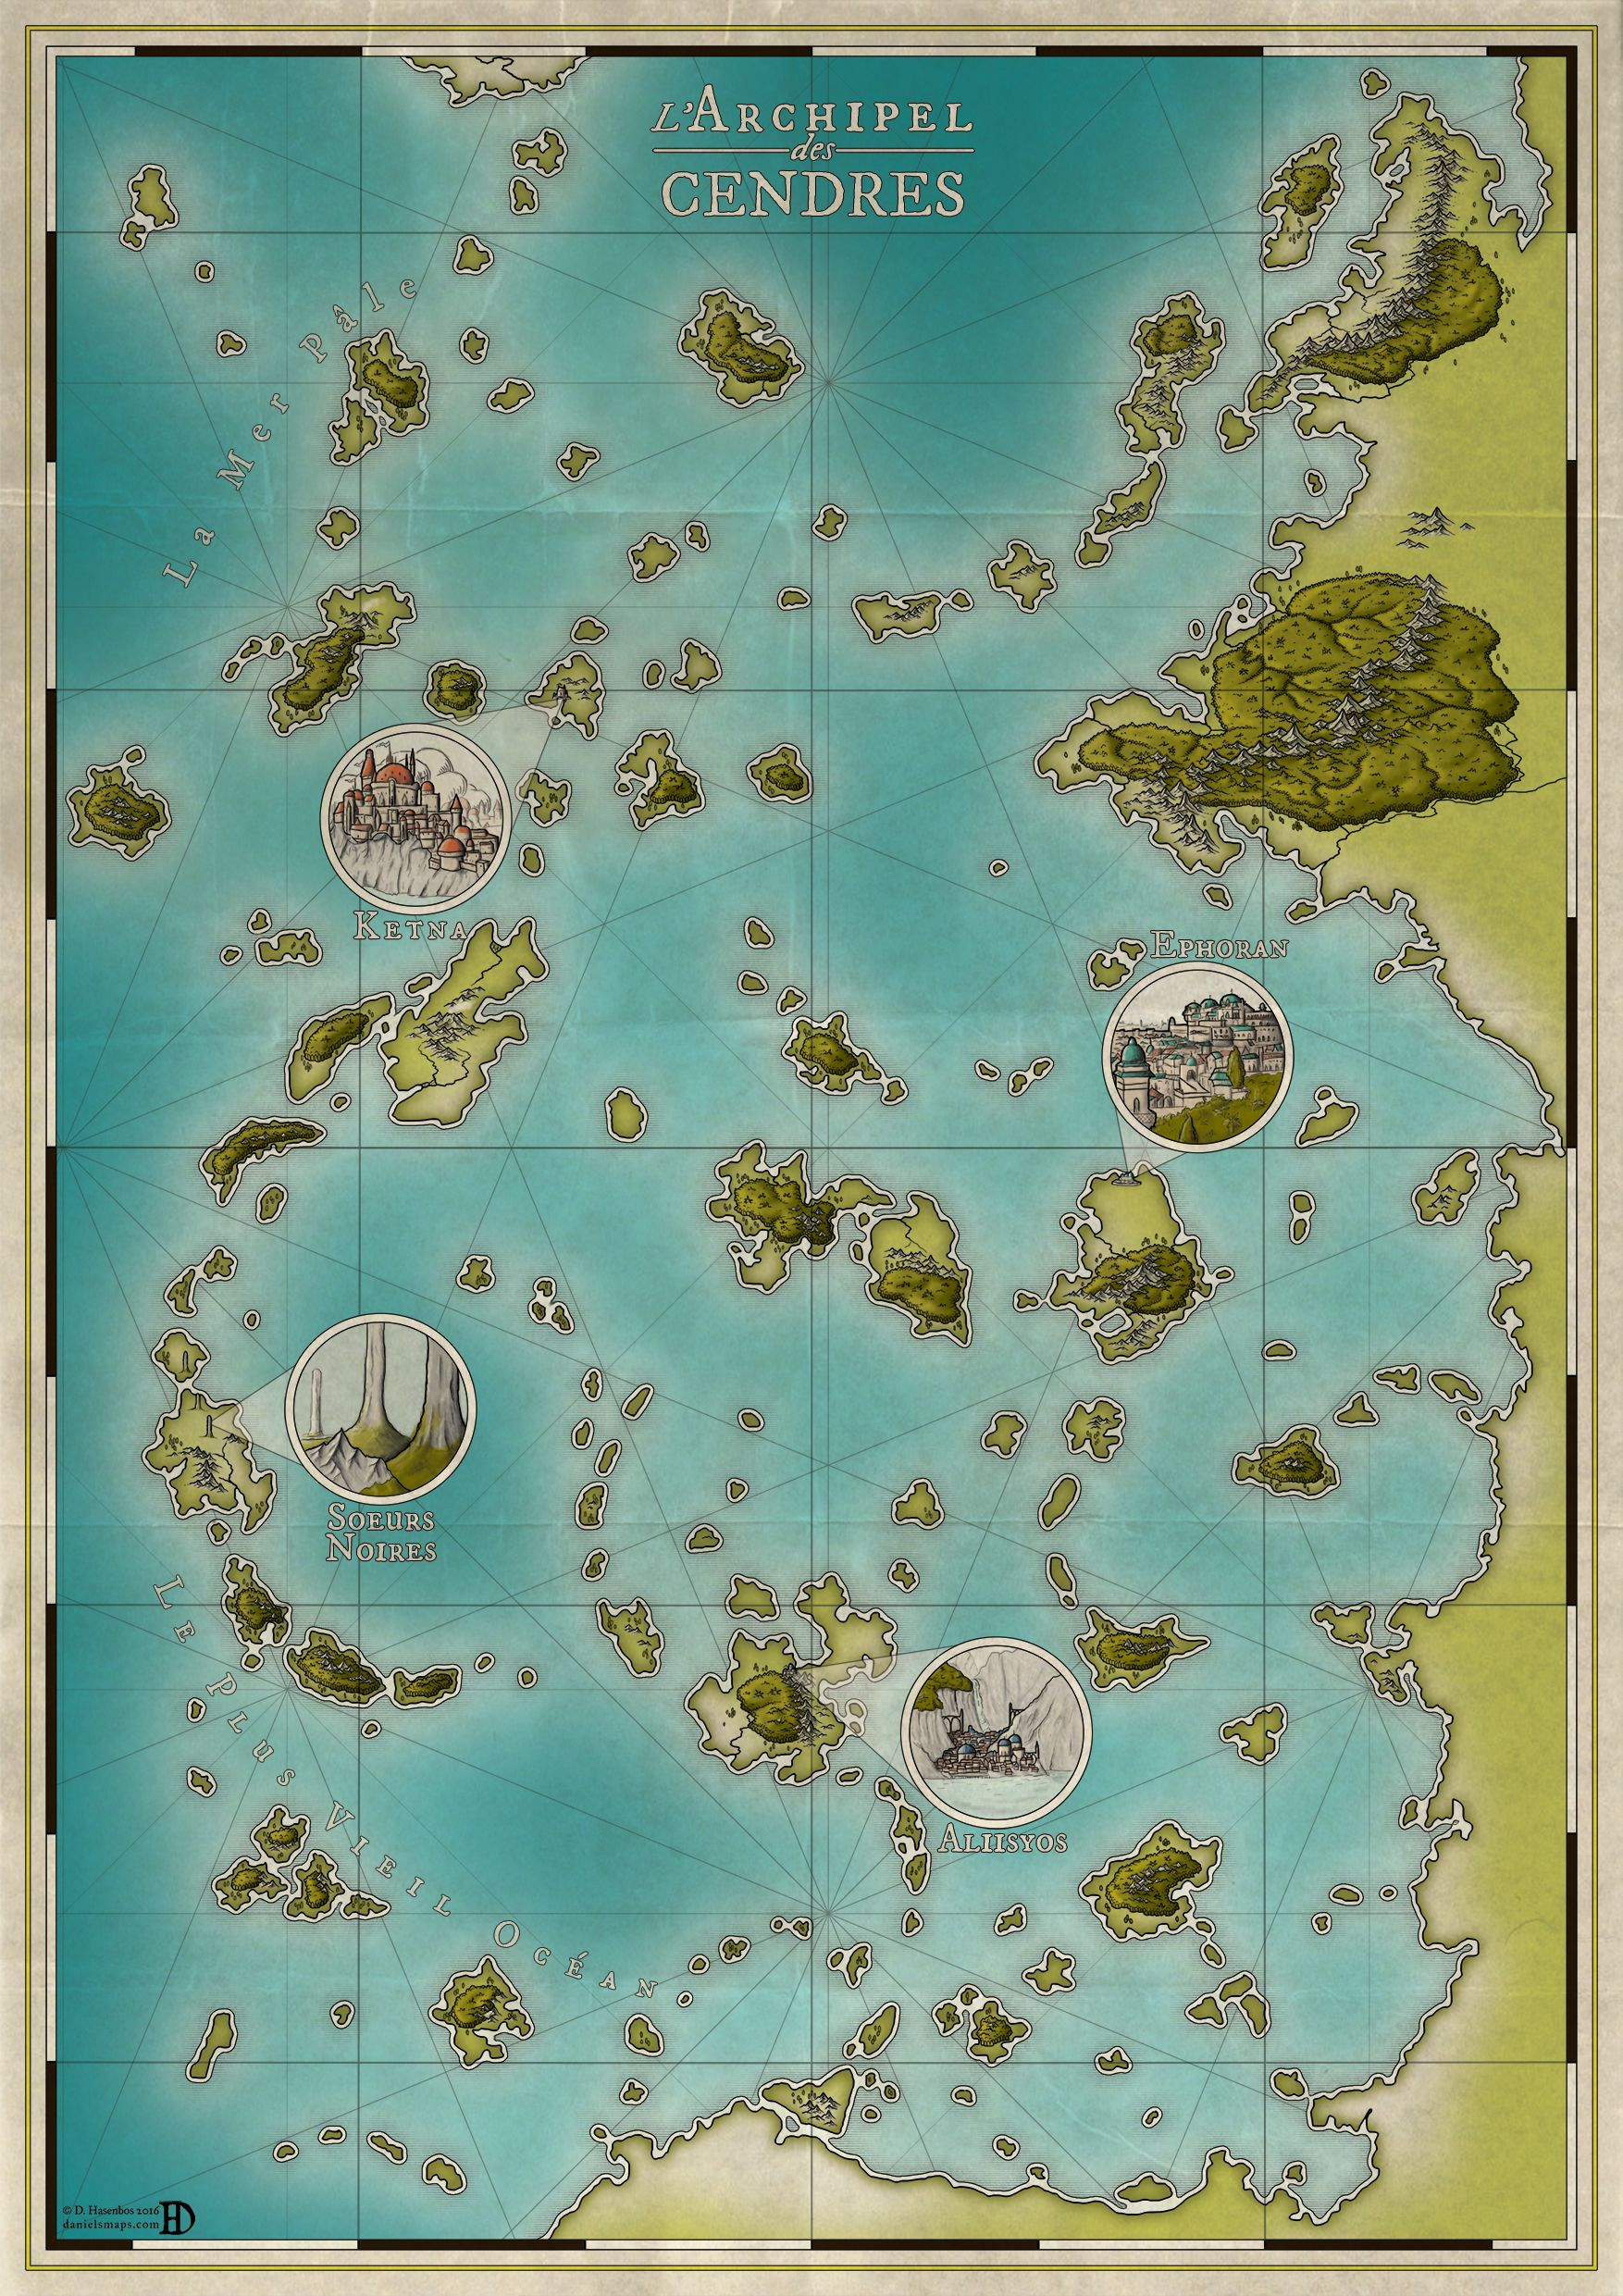 Nice island maps | Fantasy city map, Fantasy world map ... on imb world map, cn world map, uk world map, nj world map, dd world map, arizona world map, ne world map, ph world map, usvi world map, ca world map, un world map, aa world map, ap world map, kh world map, ae world map, dc world map, old world map, sc world map,